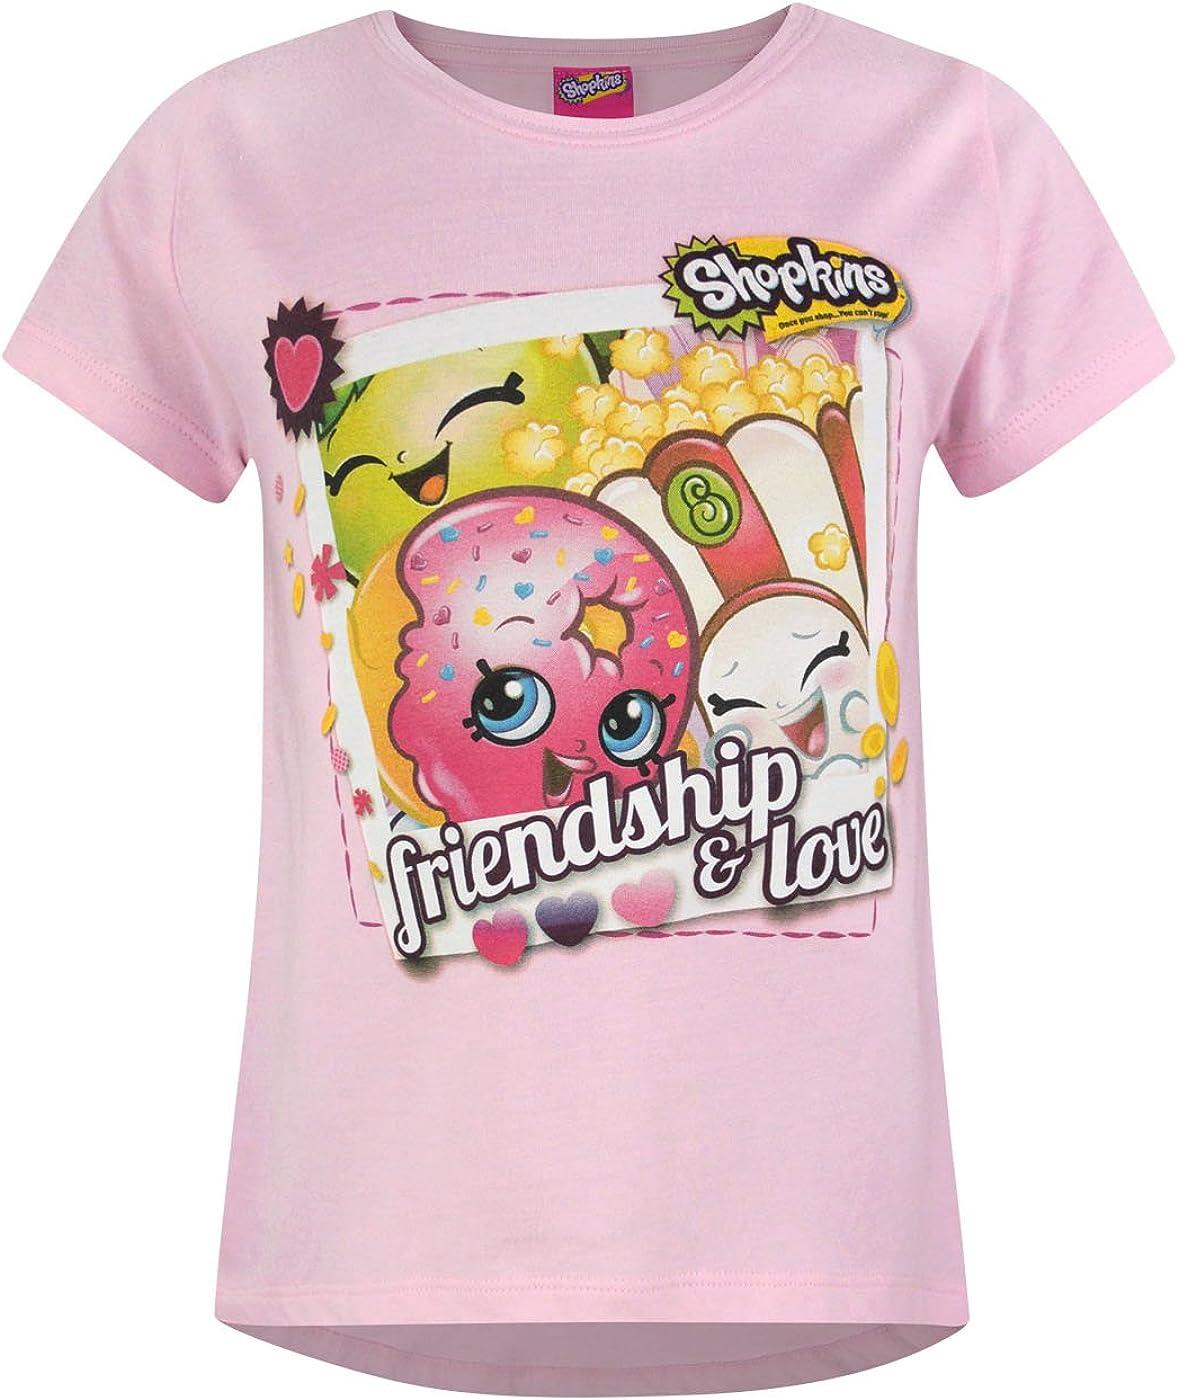 Shopkins Friendship Japan's Overseas parallel import regular item largest assortment Love Girl's T-Shirt